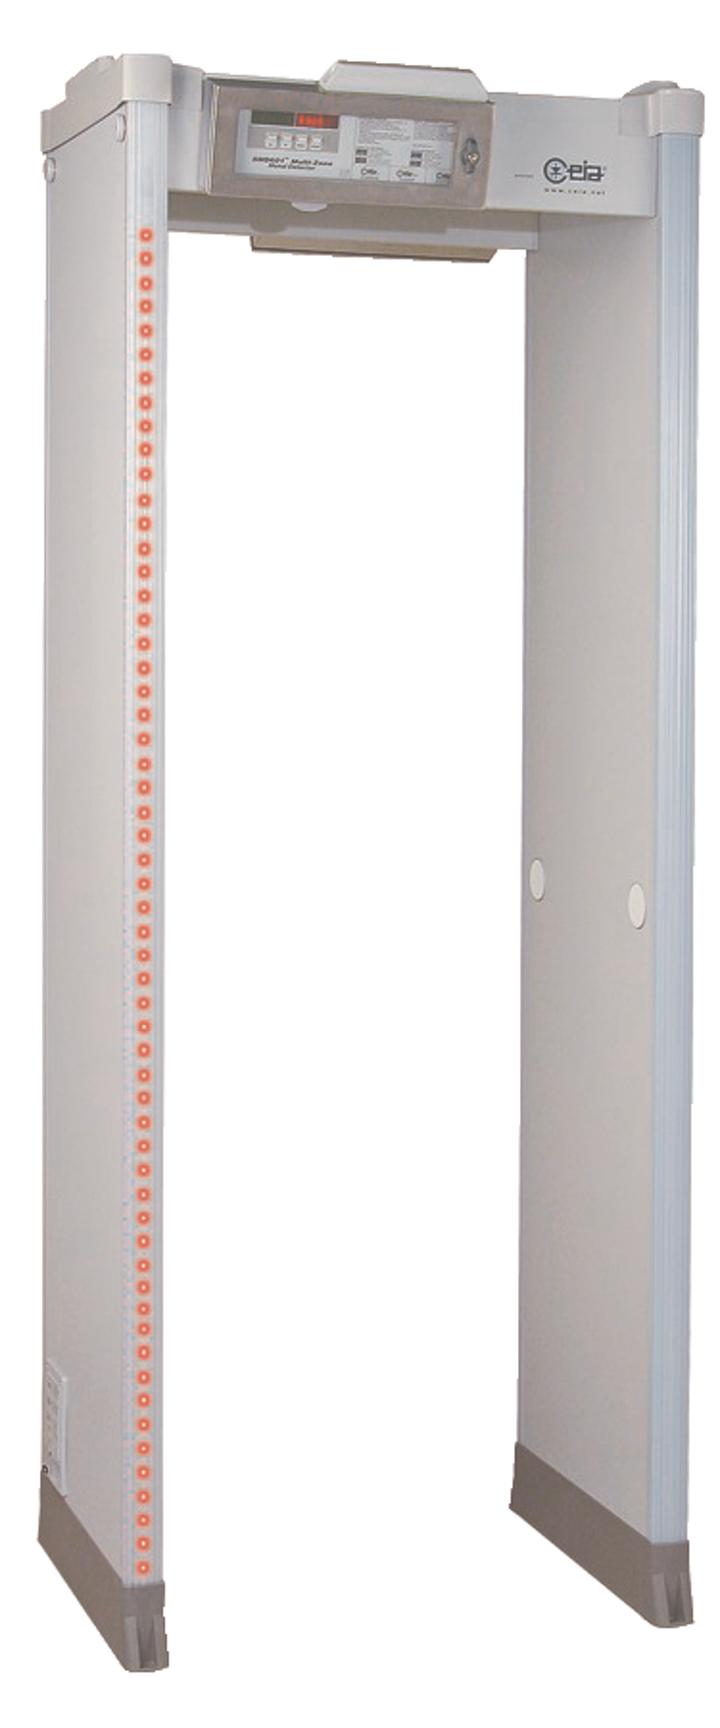 SMD601 Multi-Zone Walk Through Metal Detector